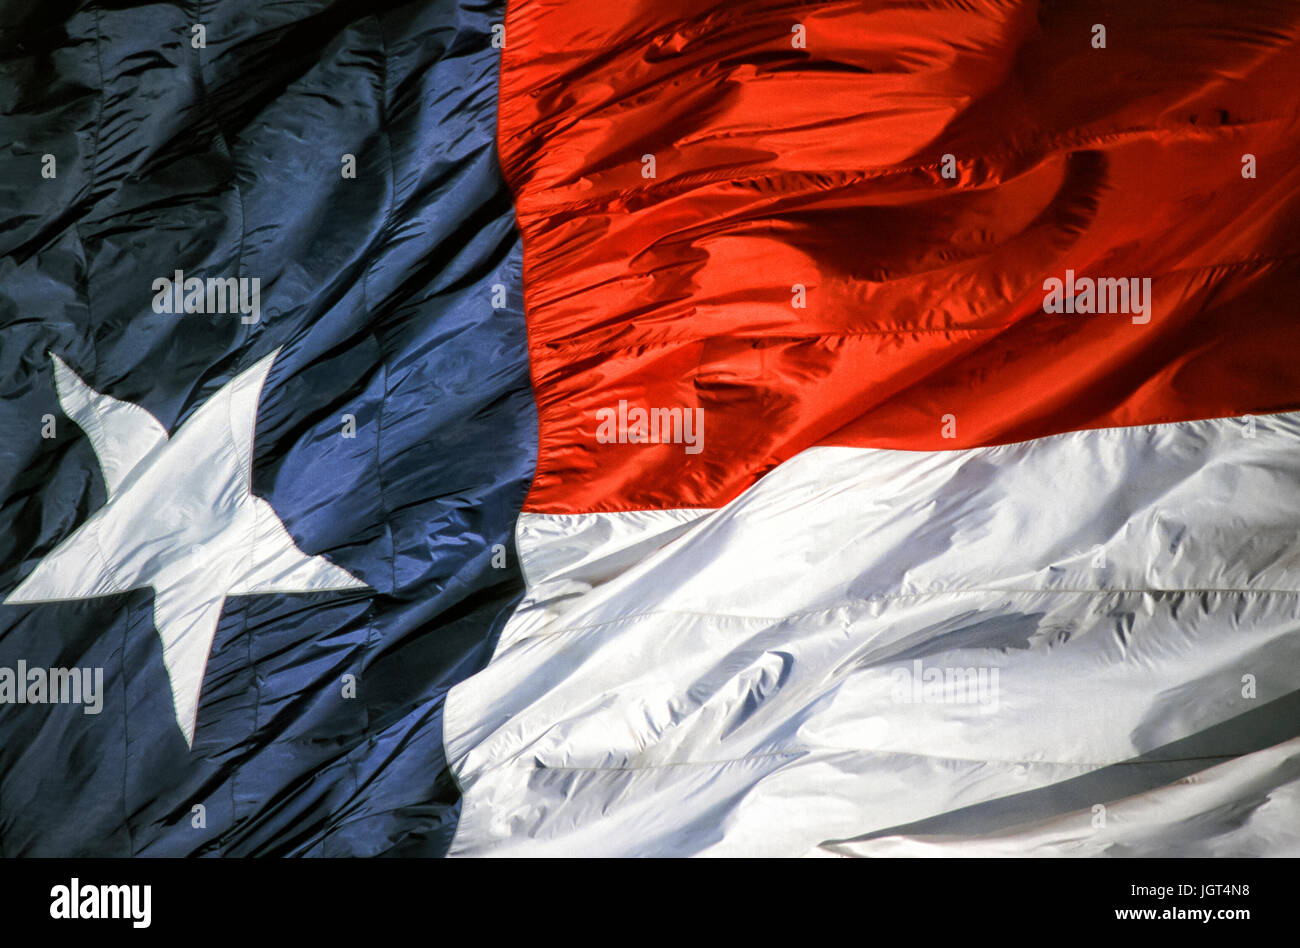 Texas Republic Imágenes De Stock & Texas Republic Fotos De Stock - Alamy